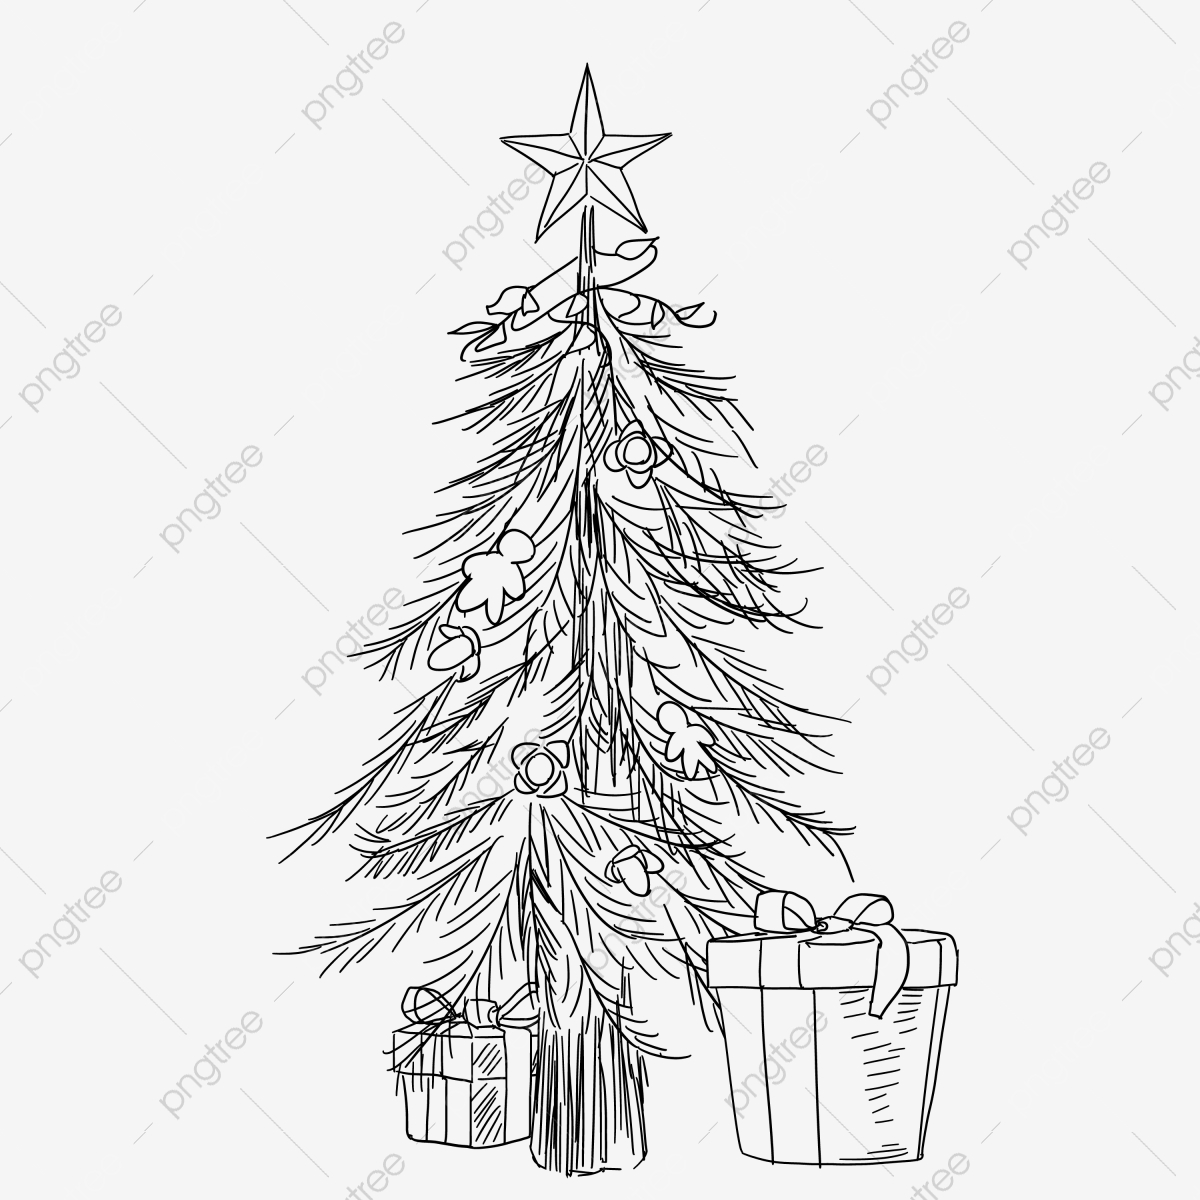 Christmas Gift Box Drawing.Line Drawing Christmas Gift Box Illustration Hand Drawn